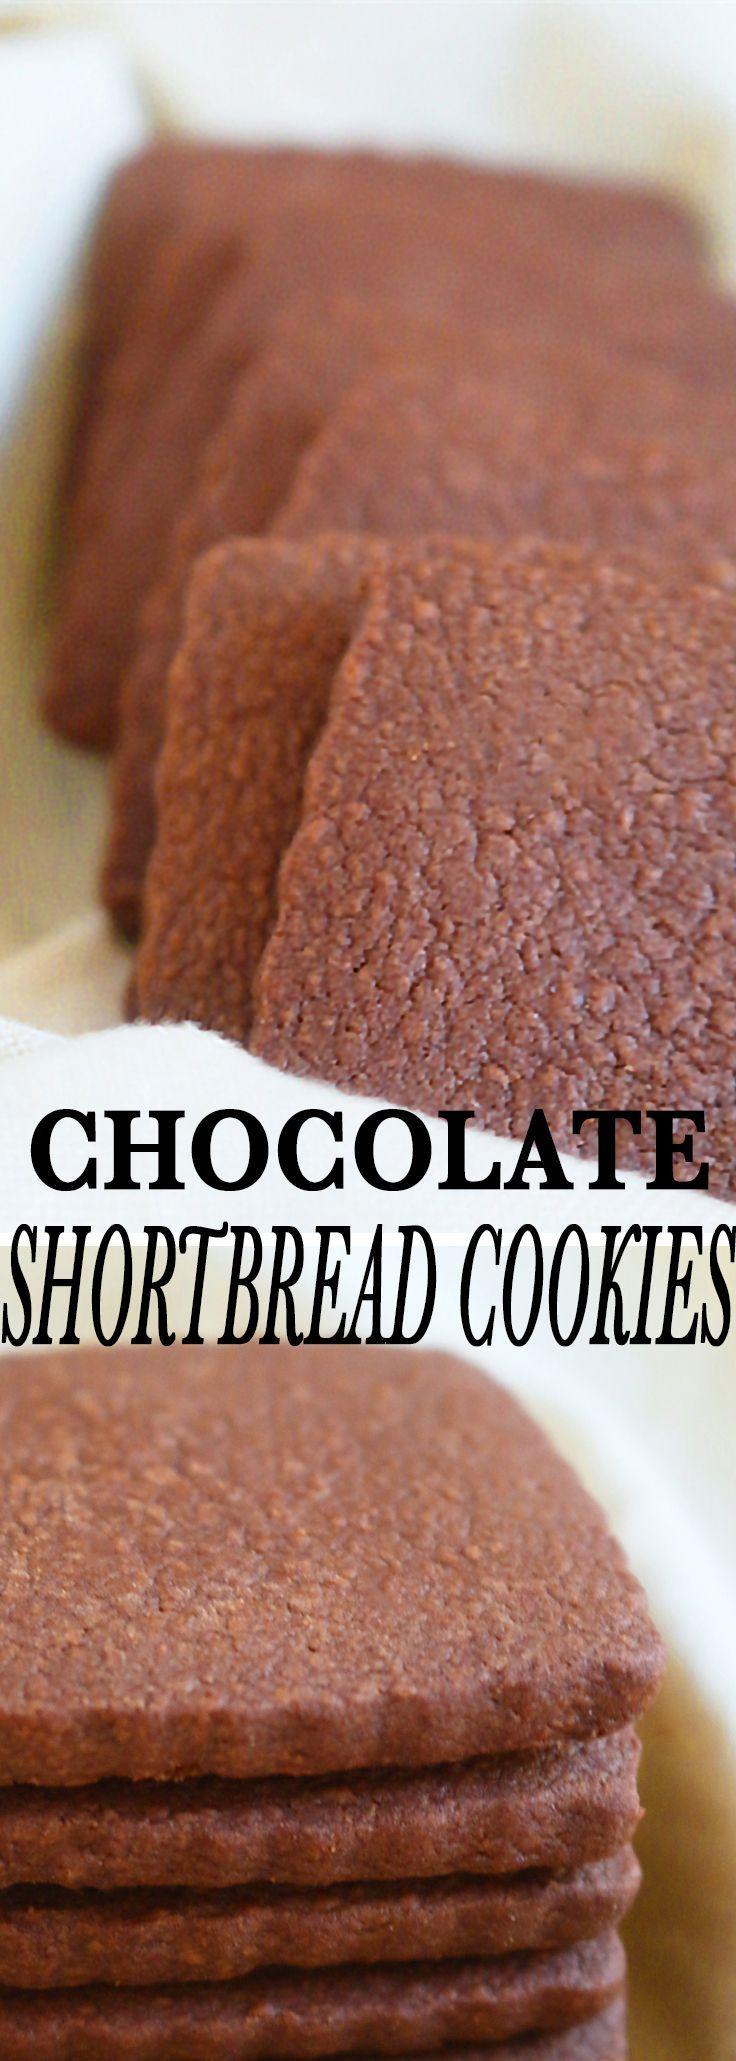 Chocolate Shortbread Cookies | Kitchen @ Hoskins